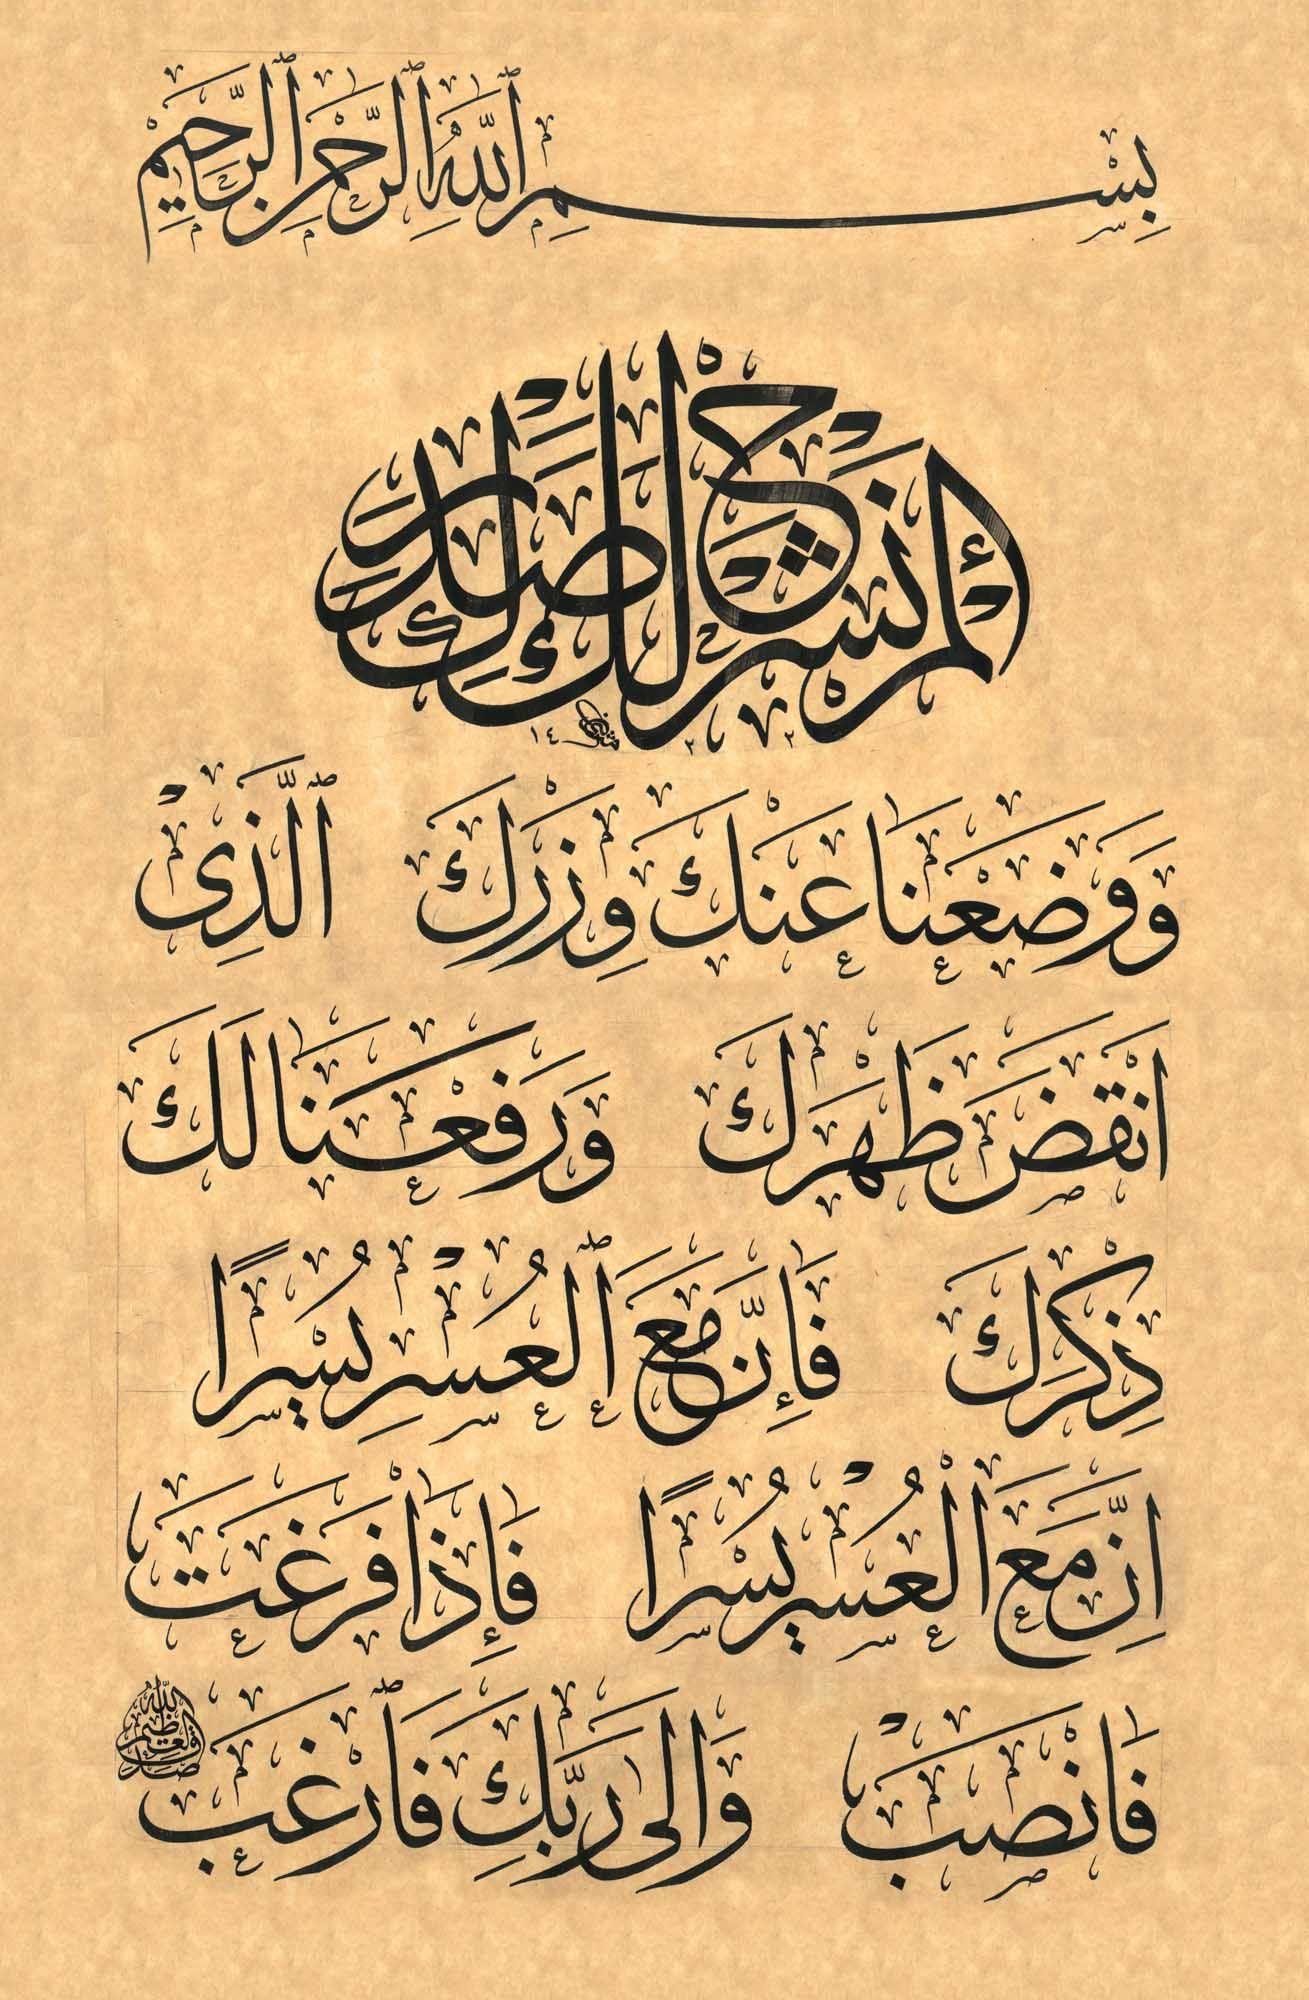 Desertrose سورة الشرح Islamic Calligraphy Islamic Art Calligraphy Calligraphy Art